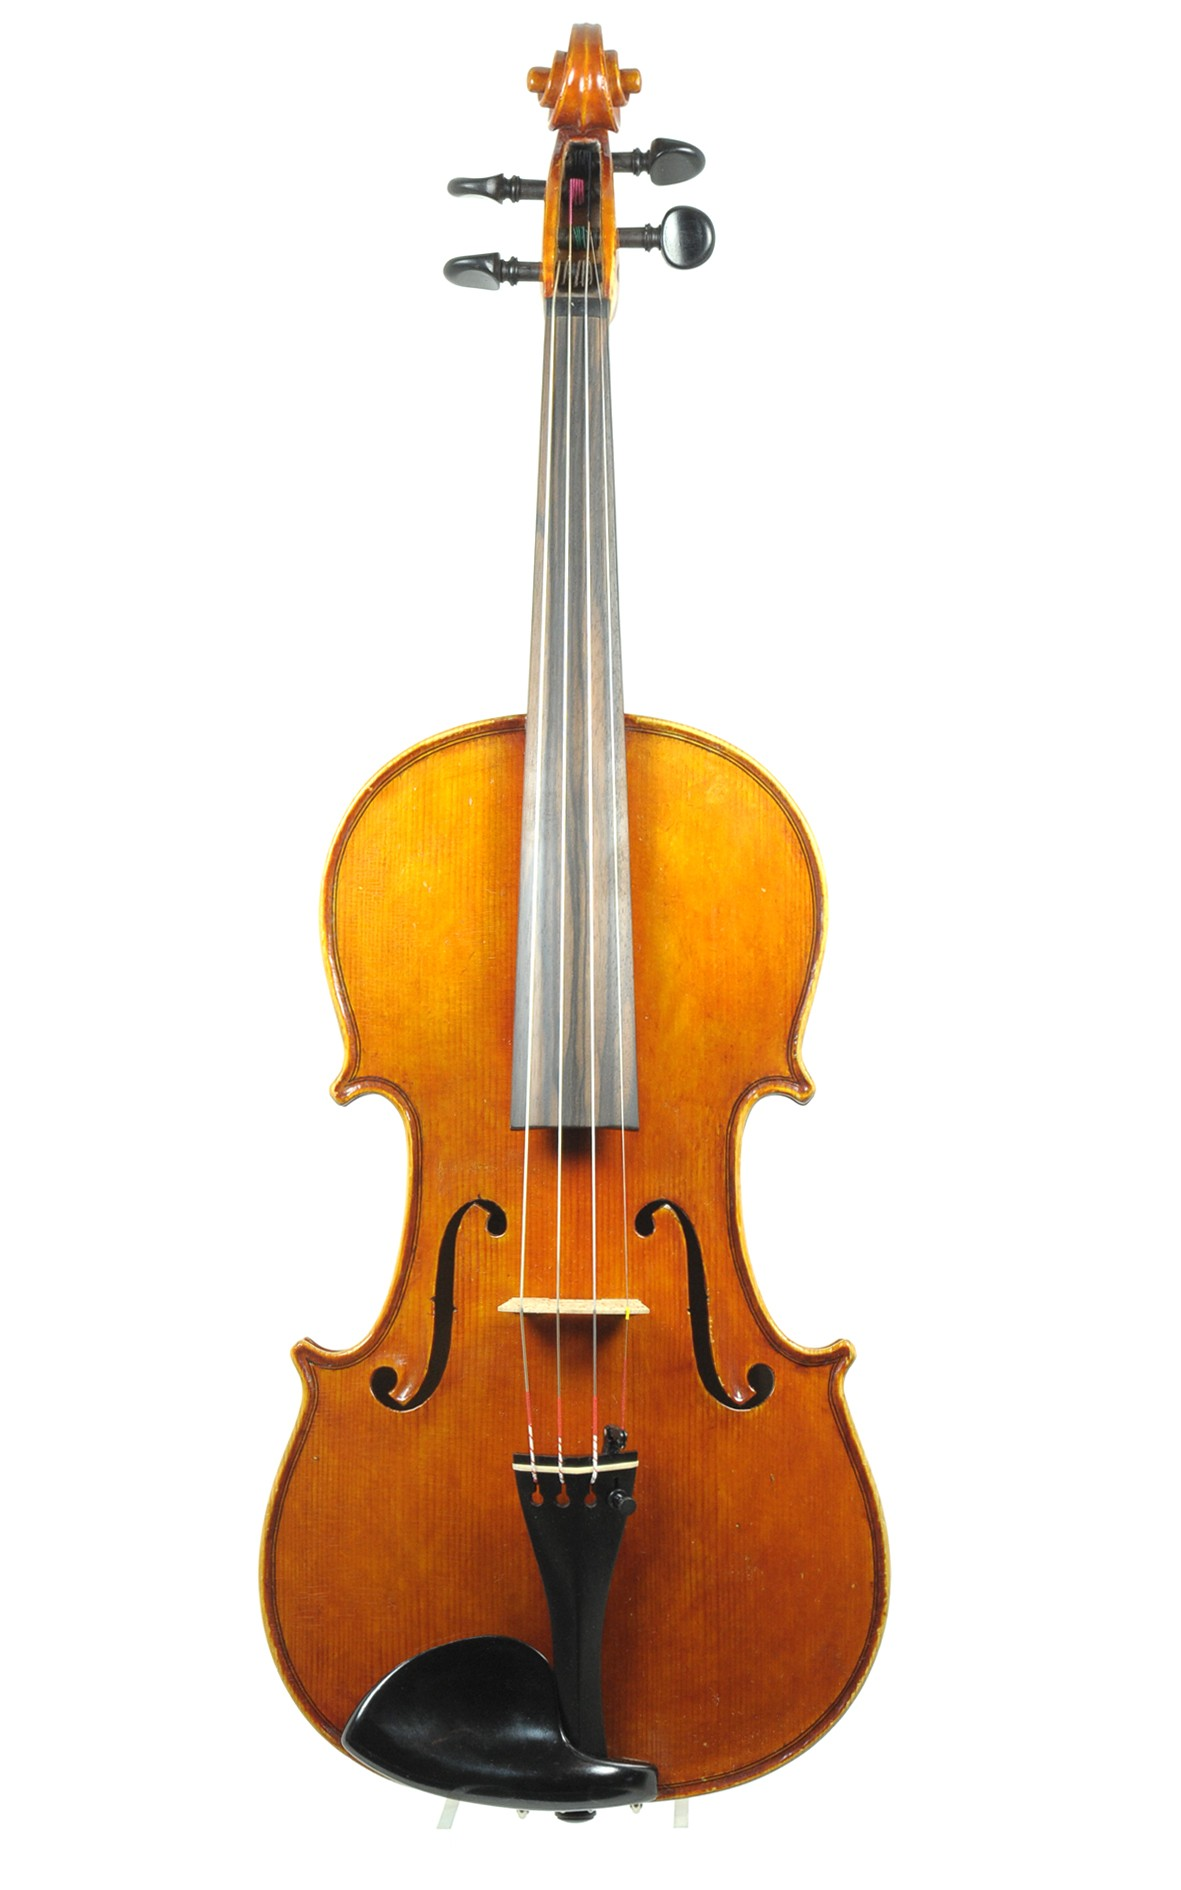 German violin - c1940